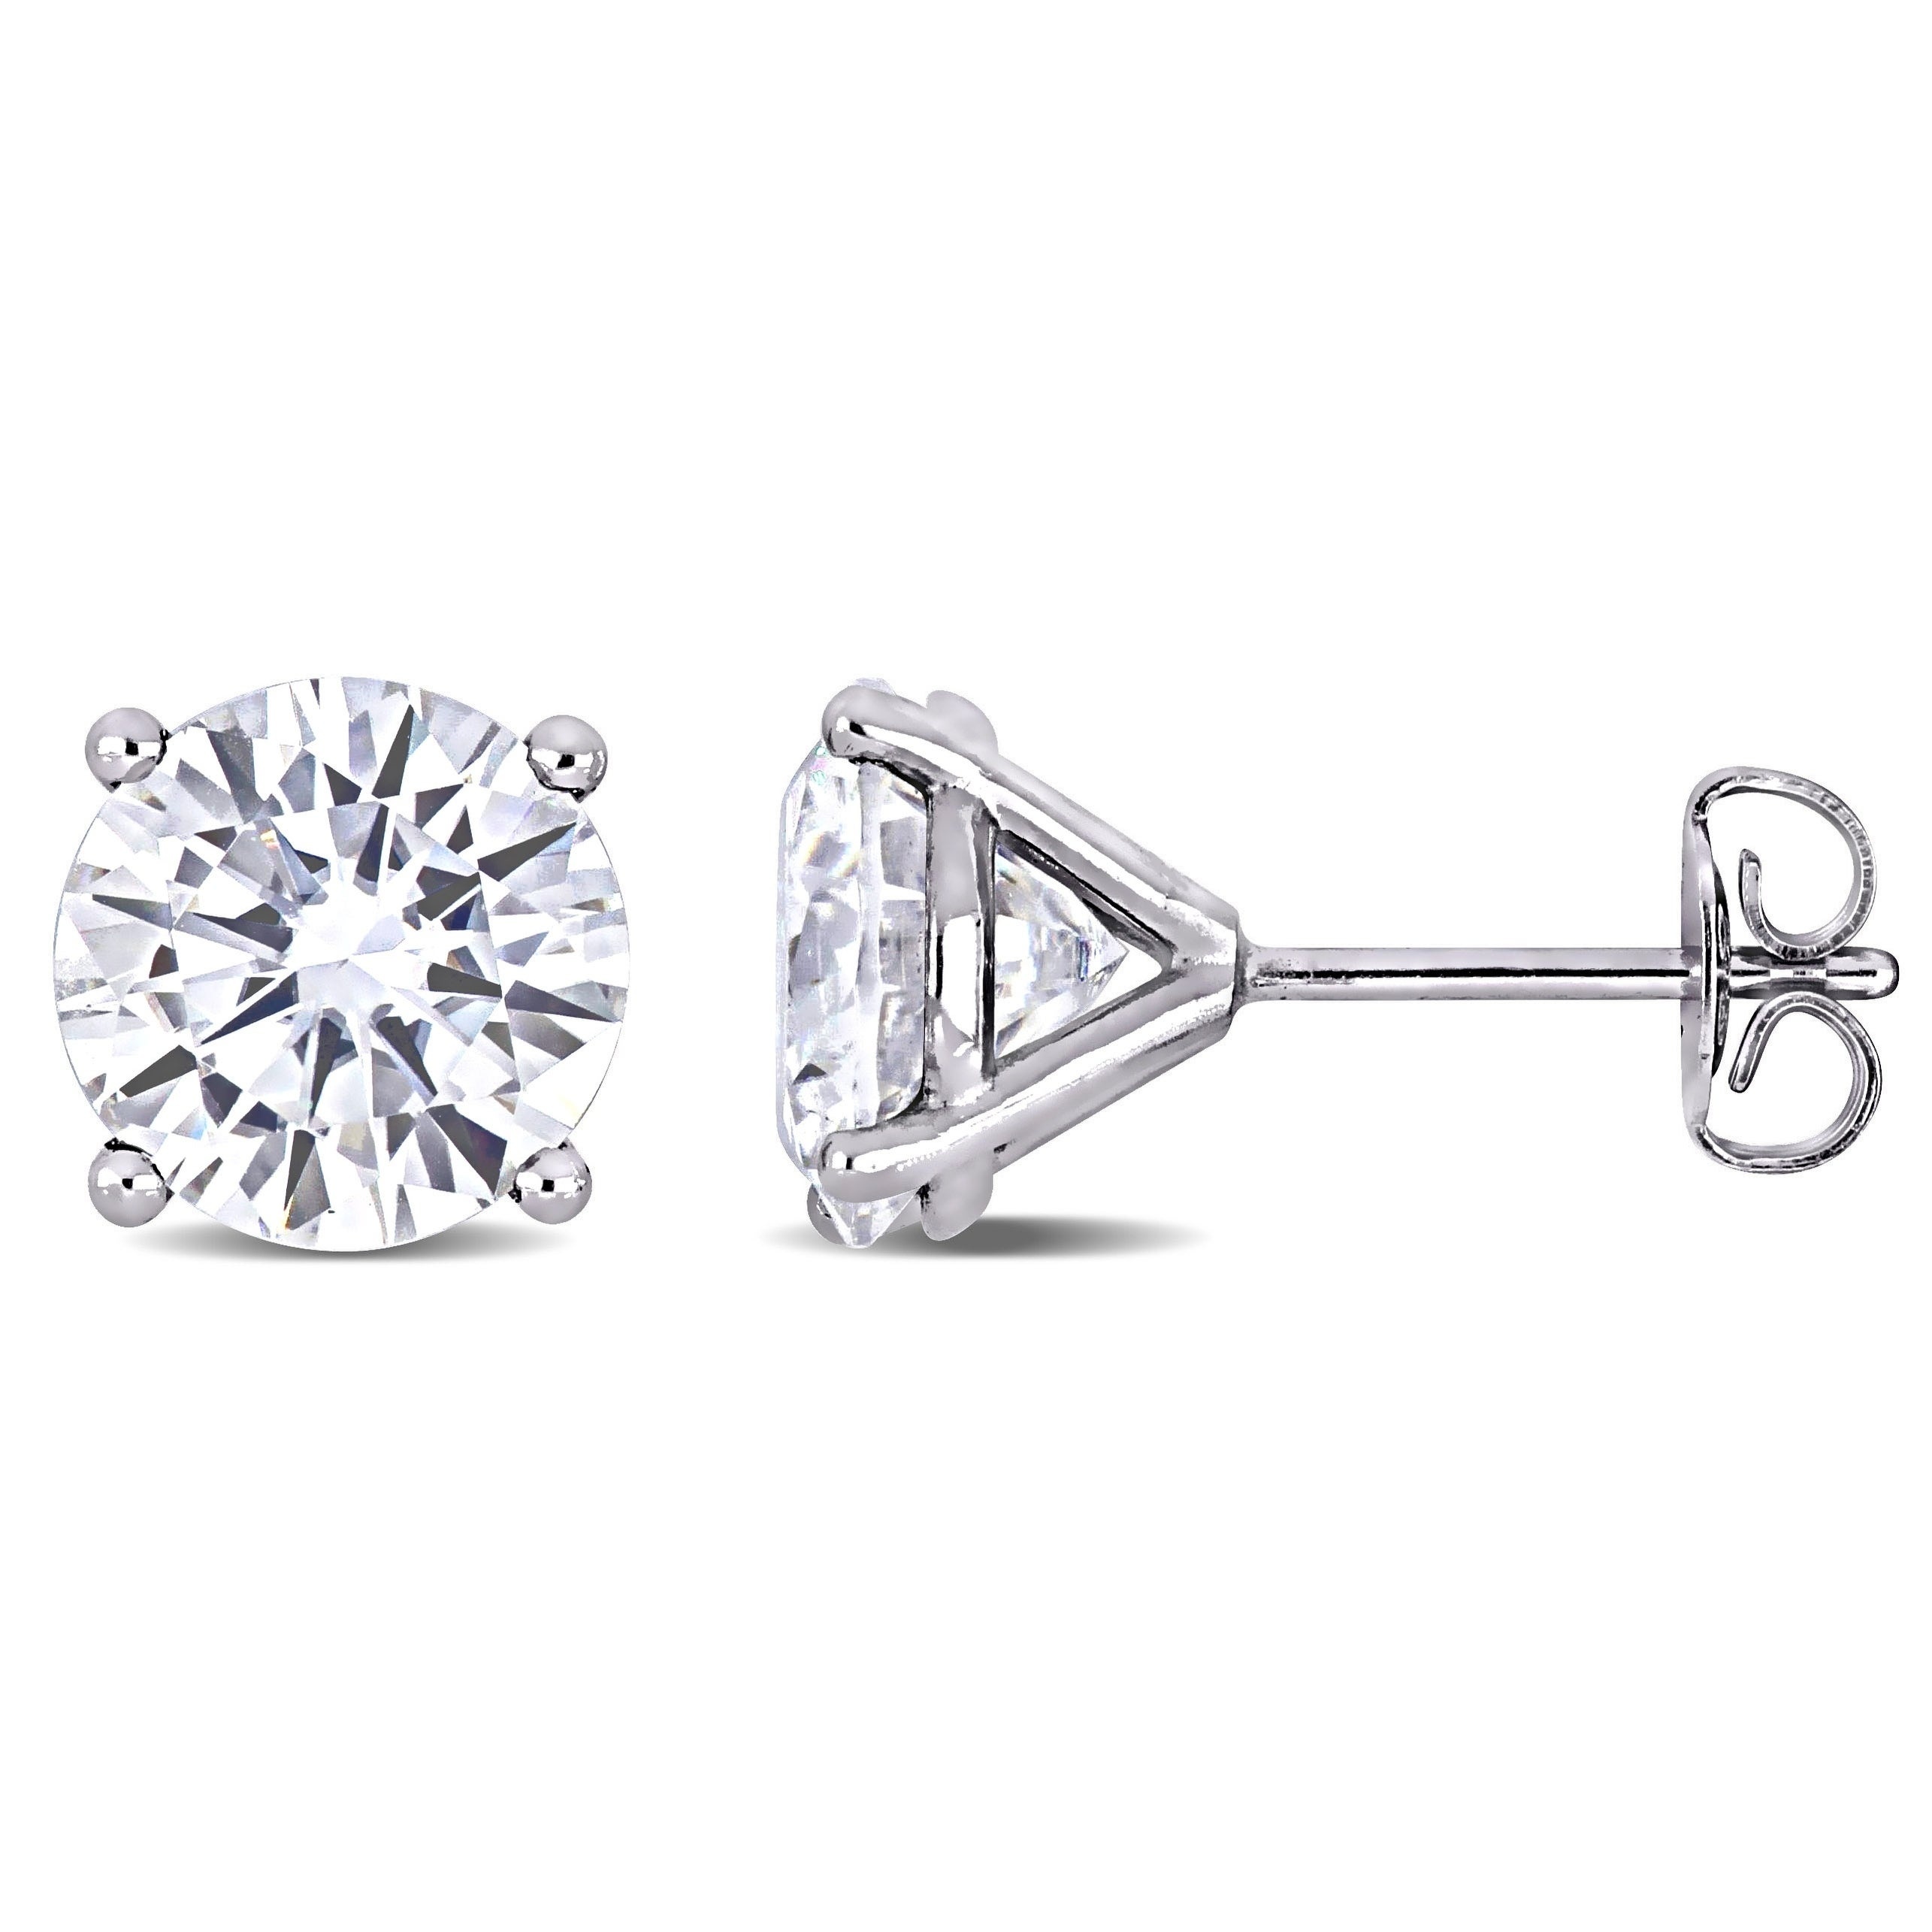 14K White Gold Finish 2Ct Round Cut Moissanite Push Back Solitaire Stud Earrings